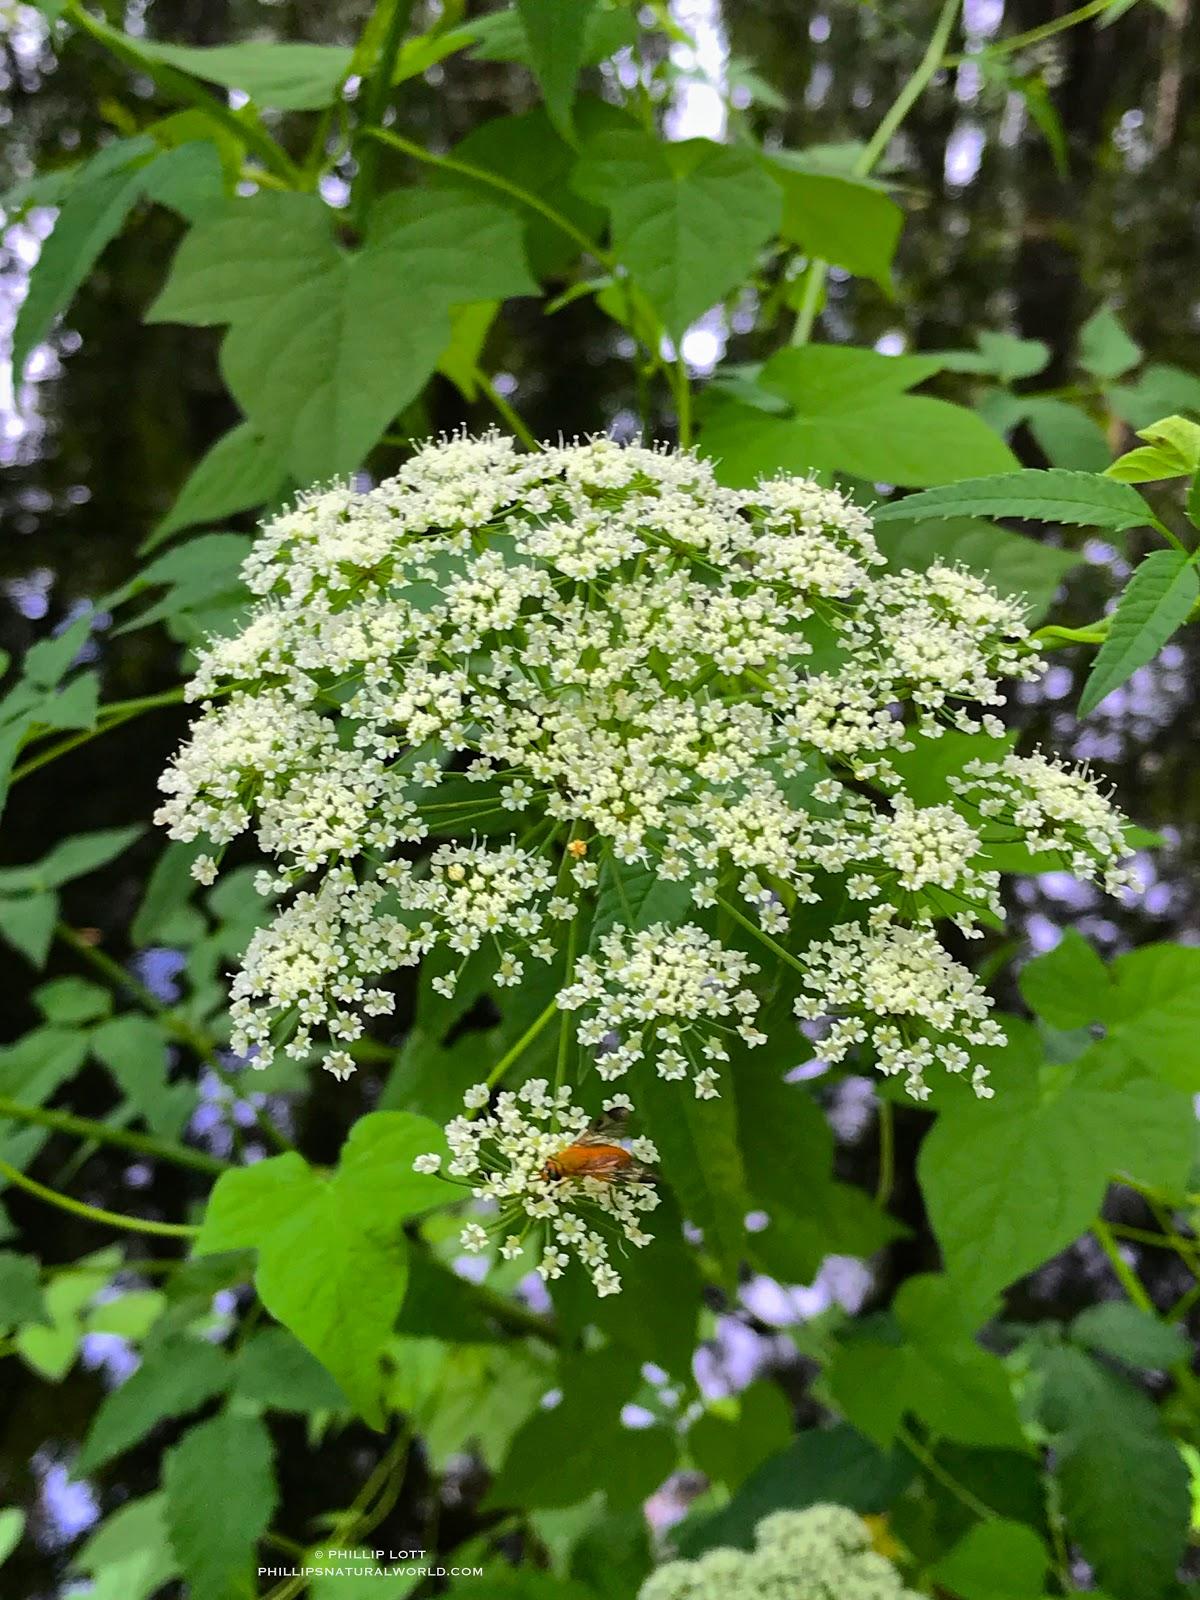 Floridas Most Poisonous Flower Phillips Natural World